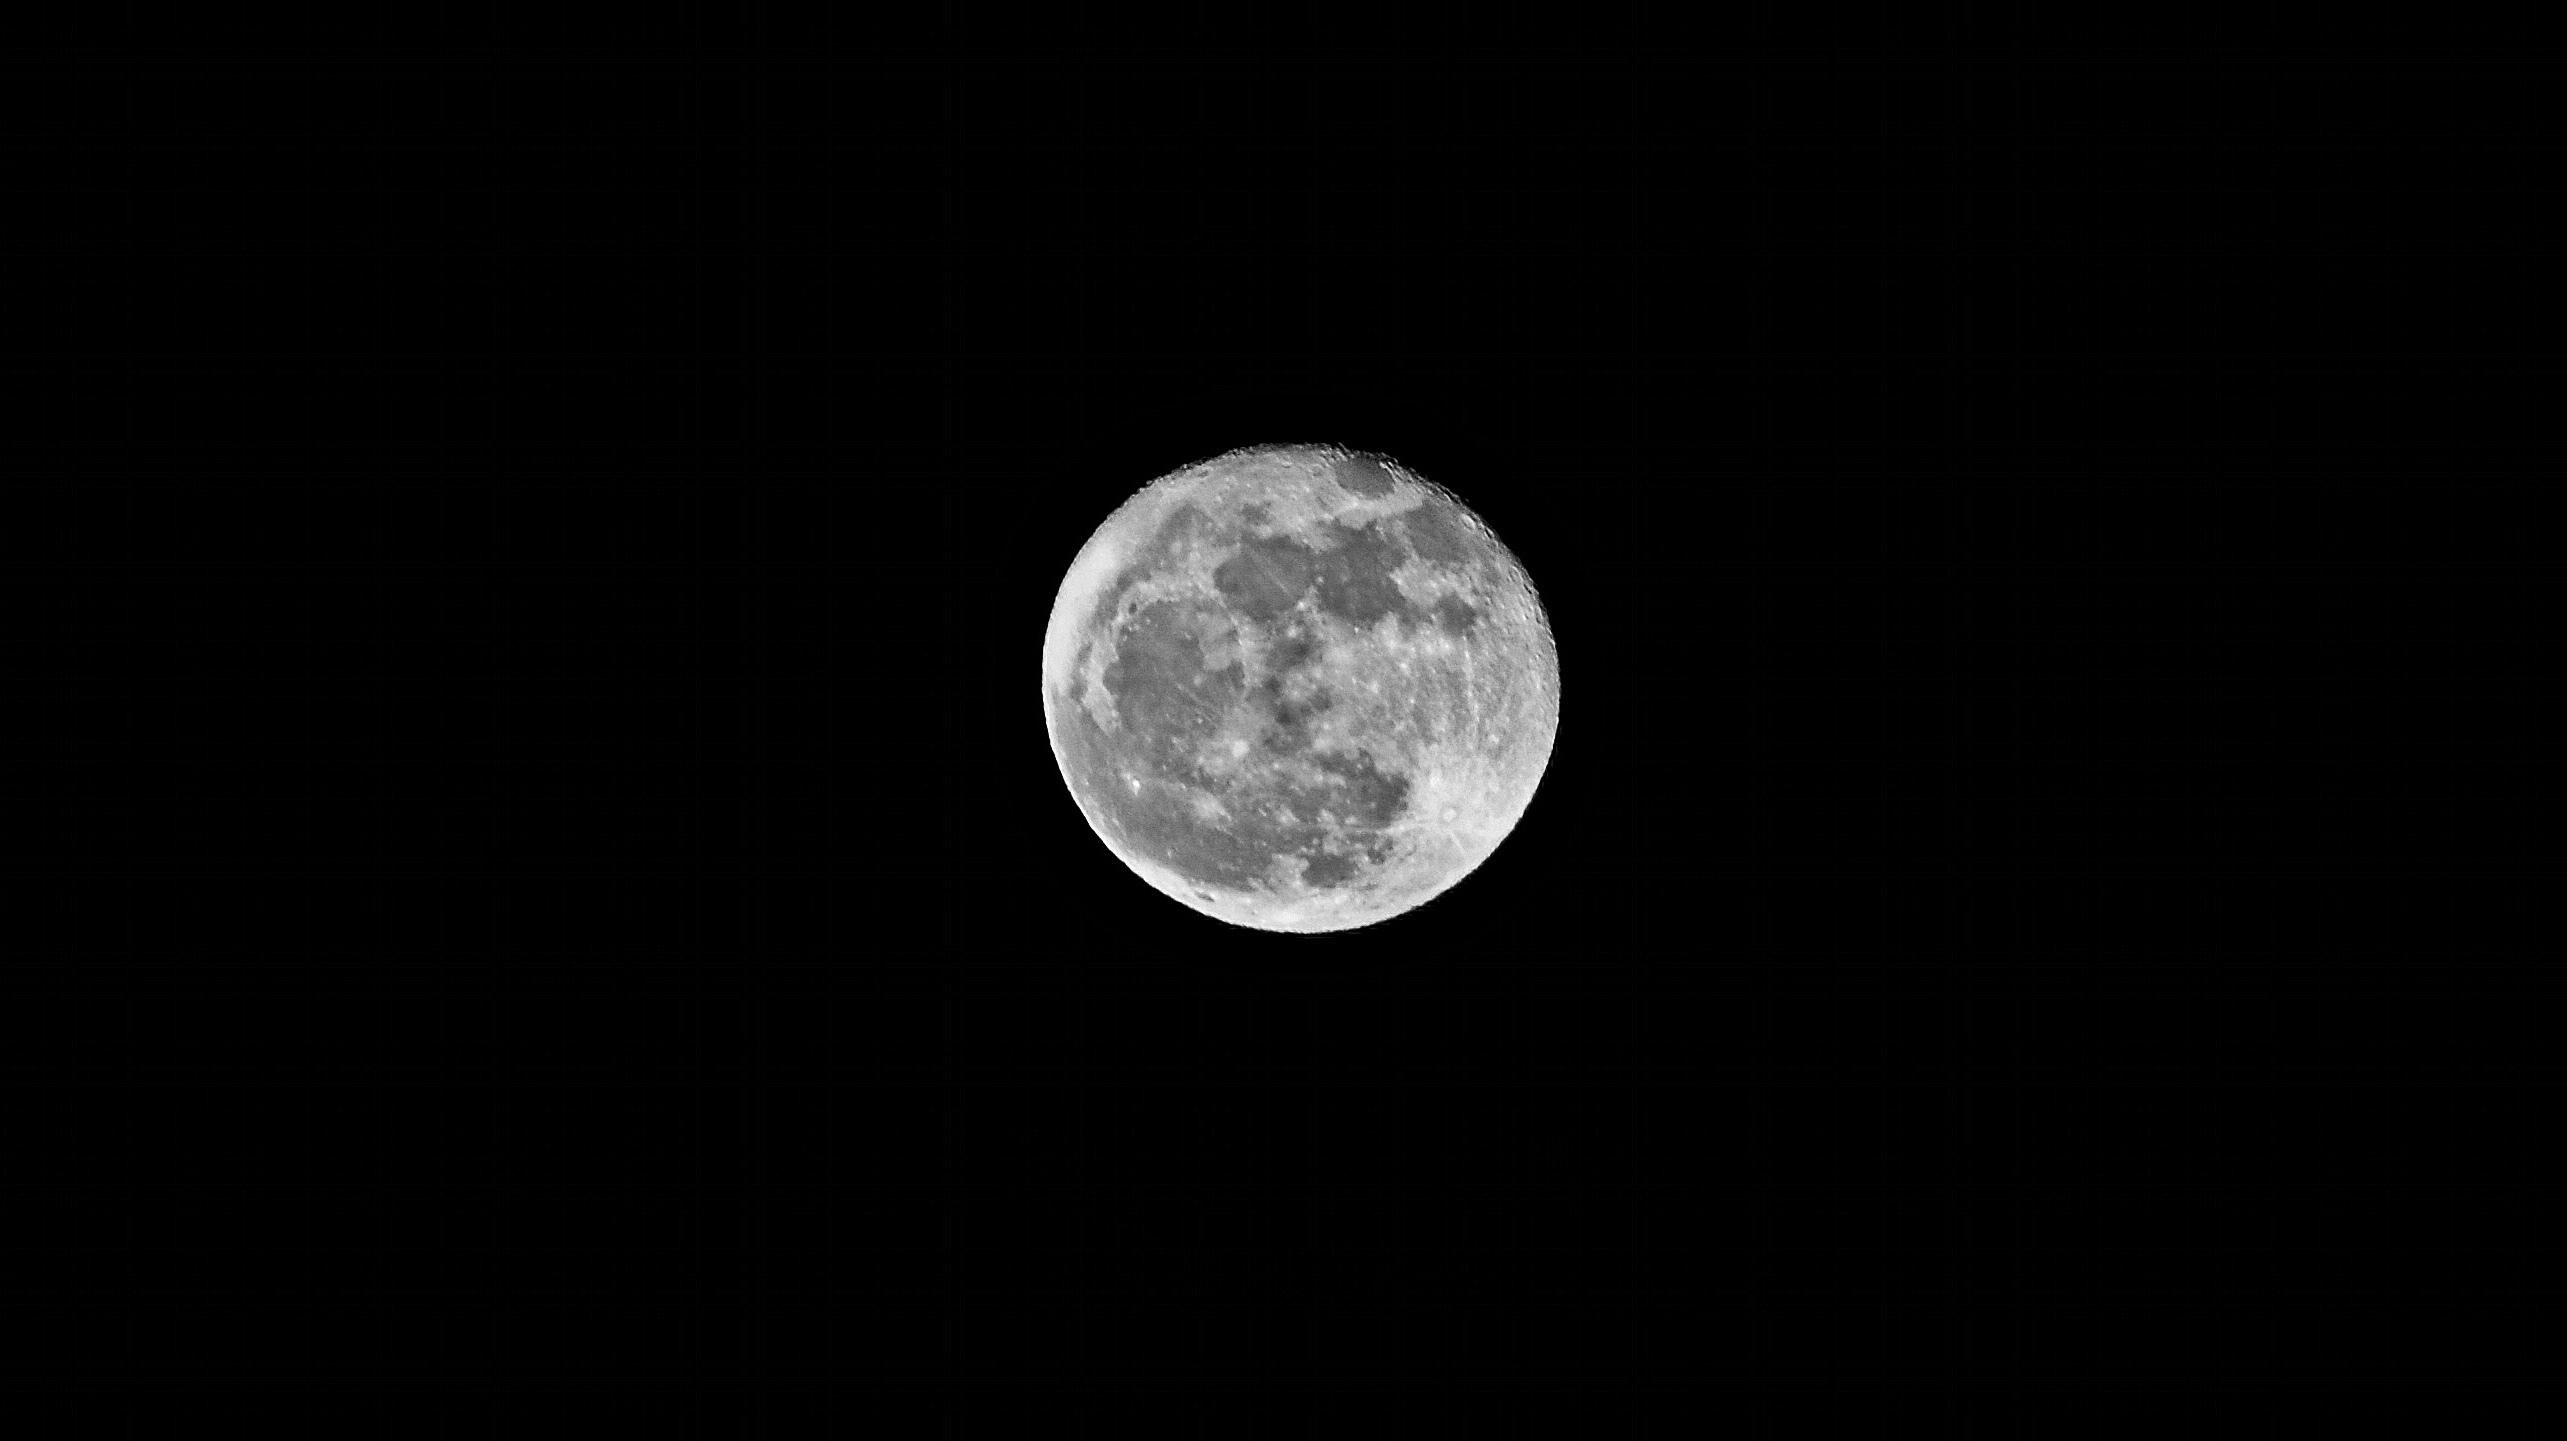 DSC_0123 Månen den 19 februari 2011 kopiera 2